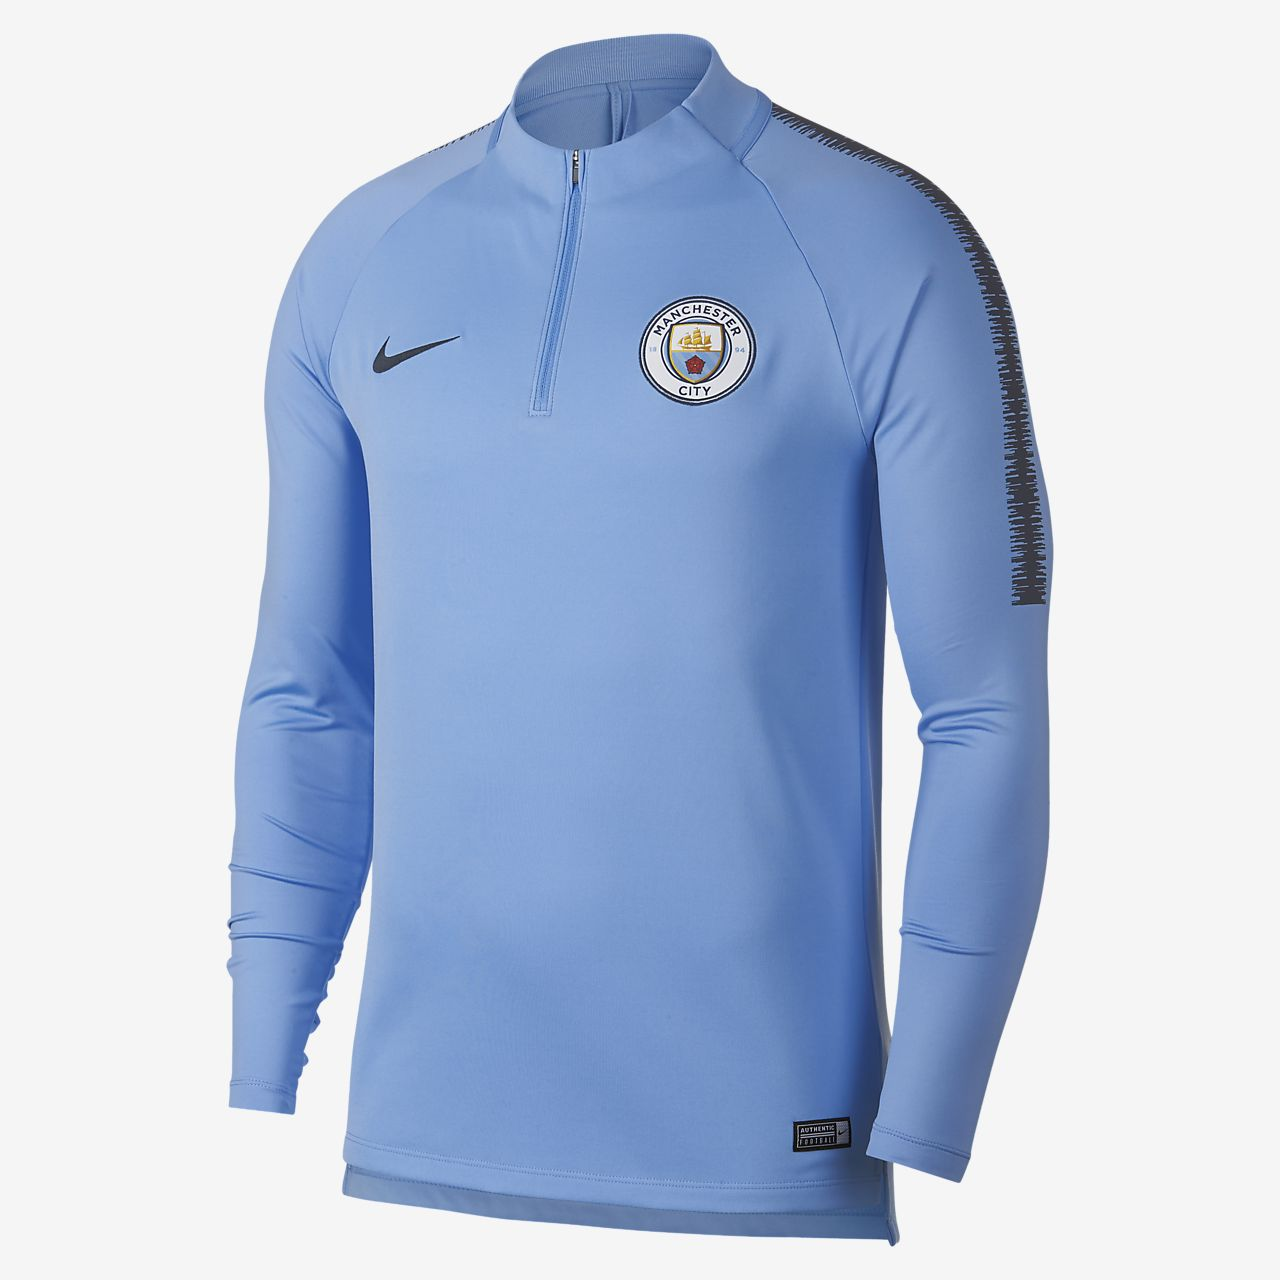 b42519fb85c Manchester City FC Dri-FIT Squad Drill Men s Long-Sleeve Football ...